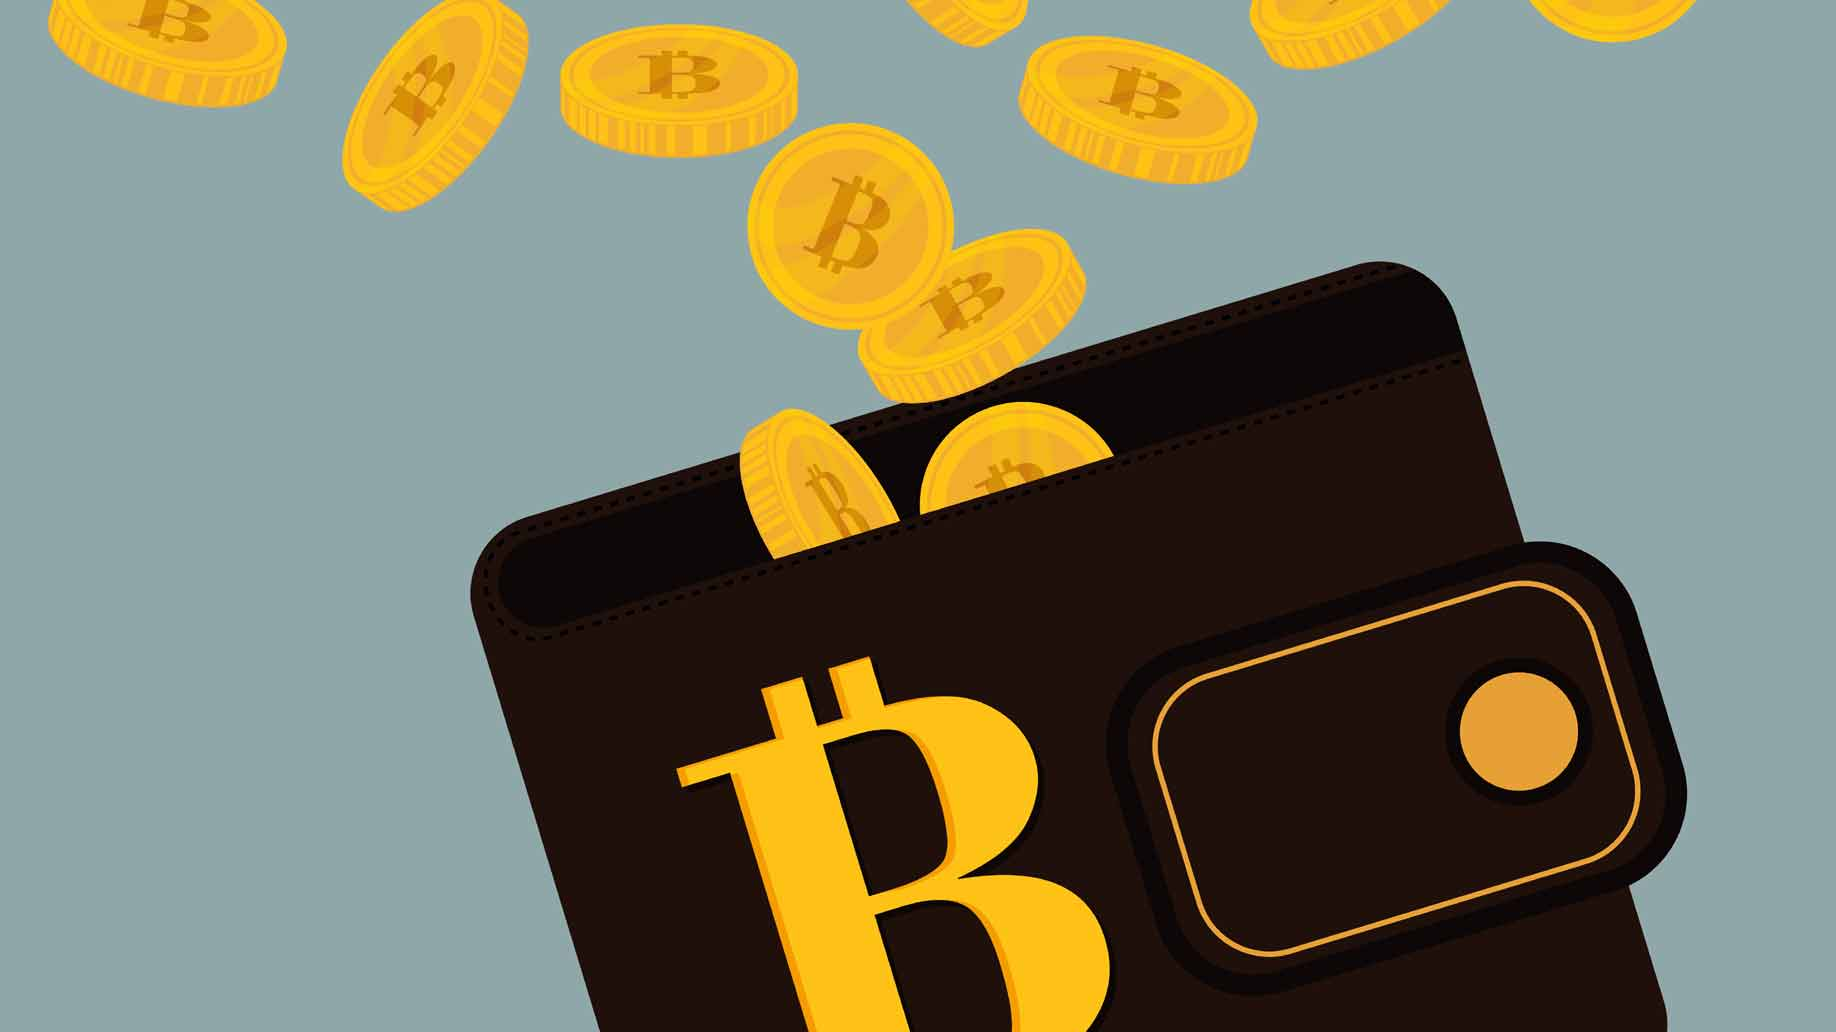 Bitcoin Kryptowährung virtuelle Geldbörse